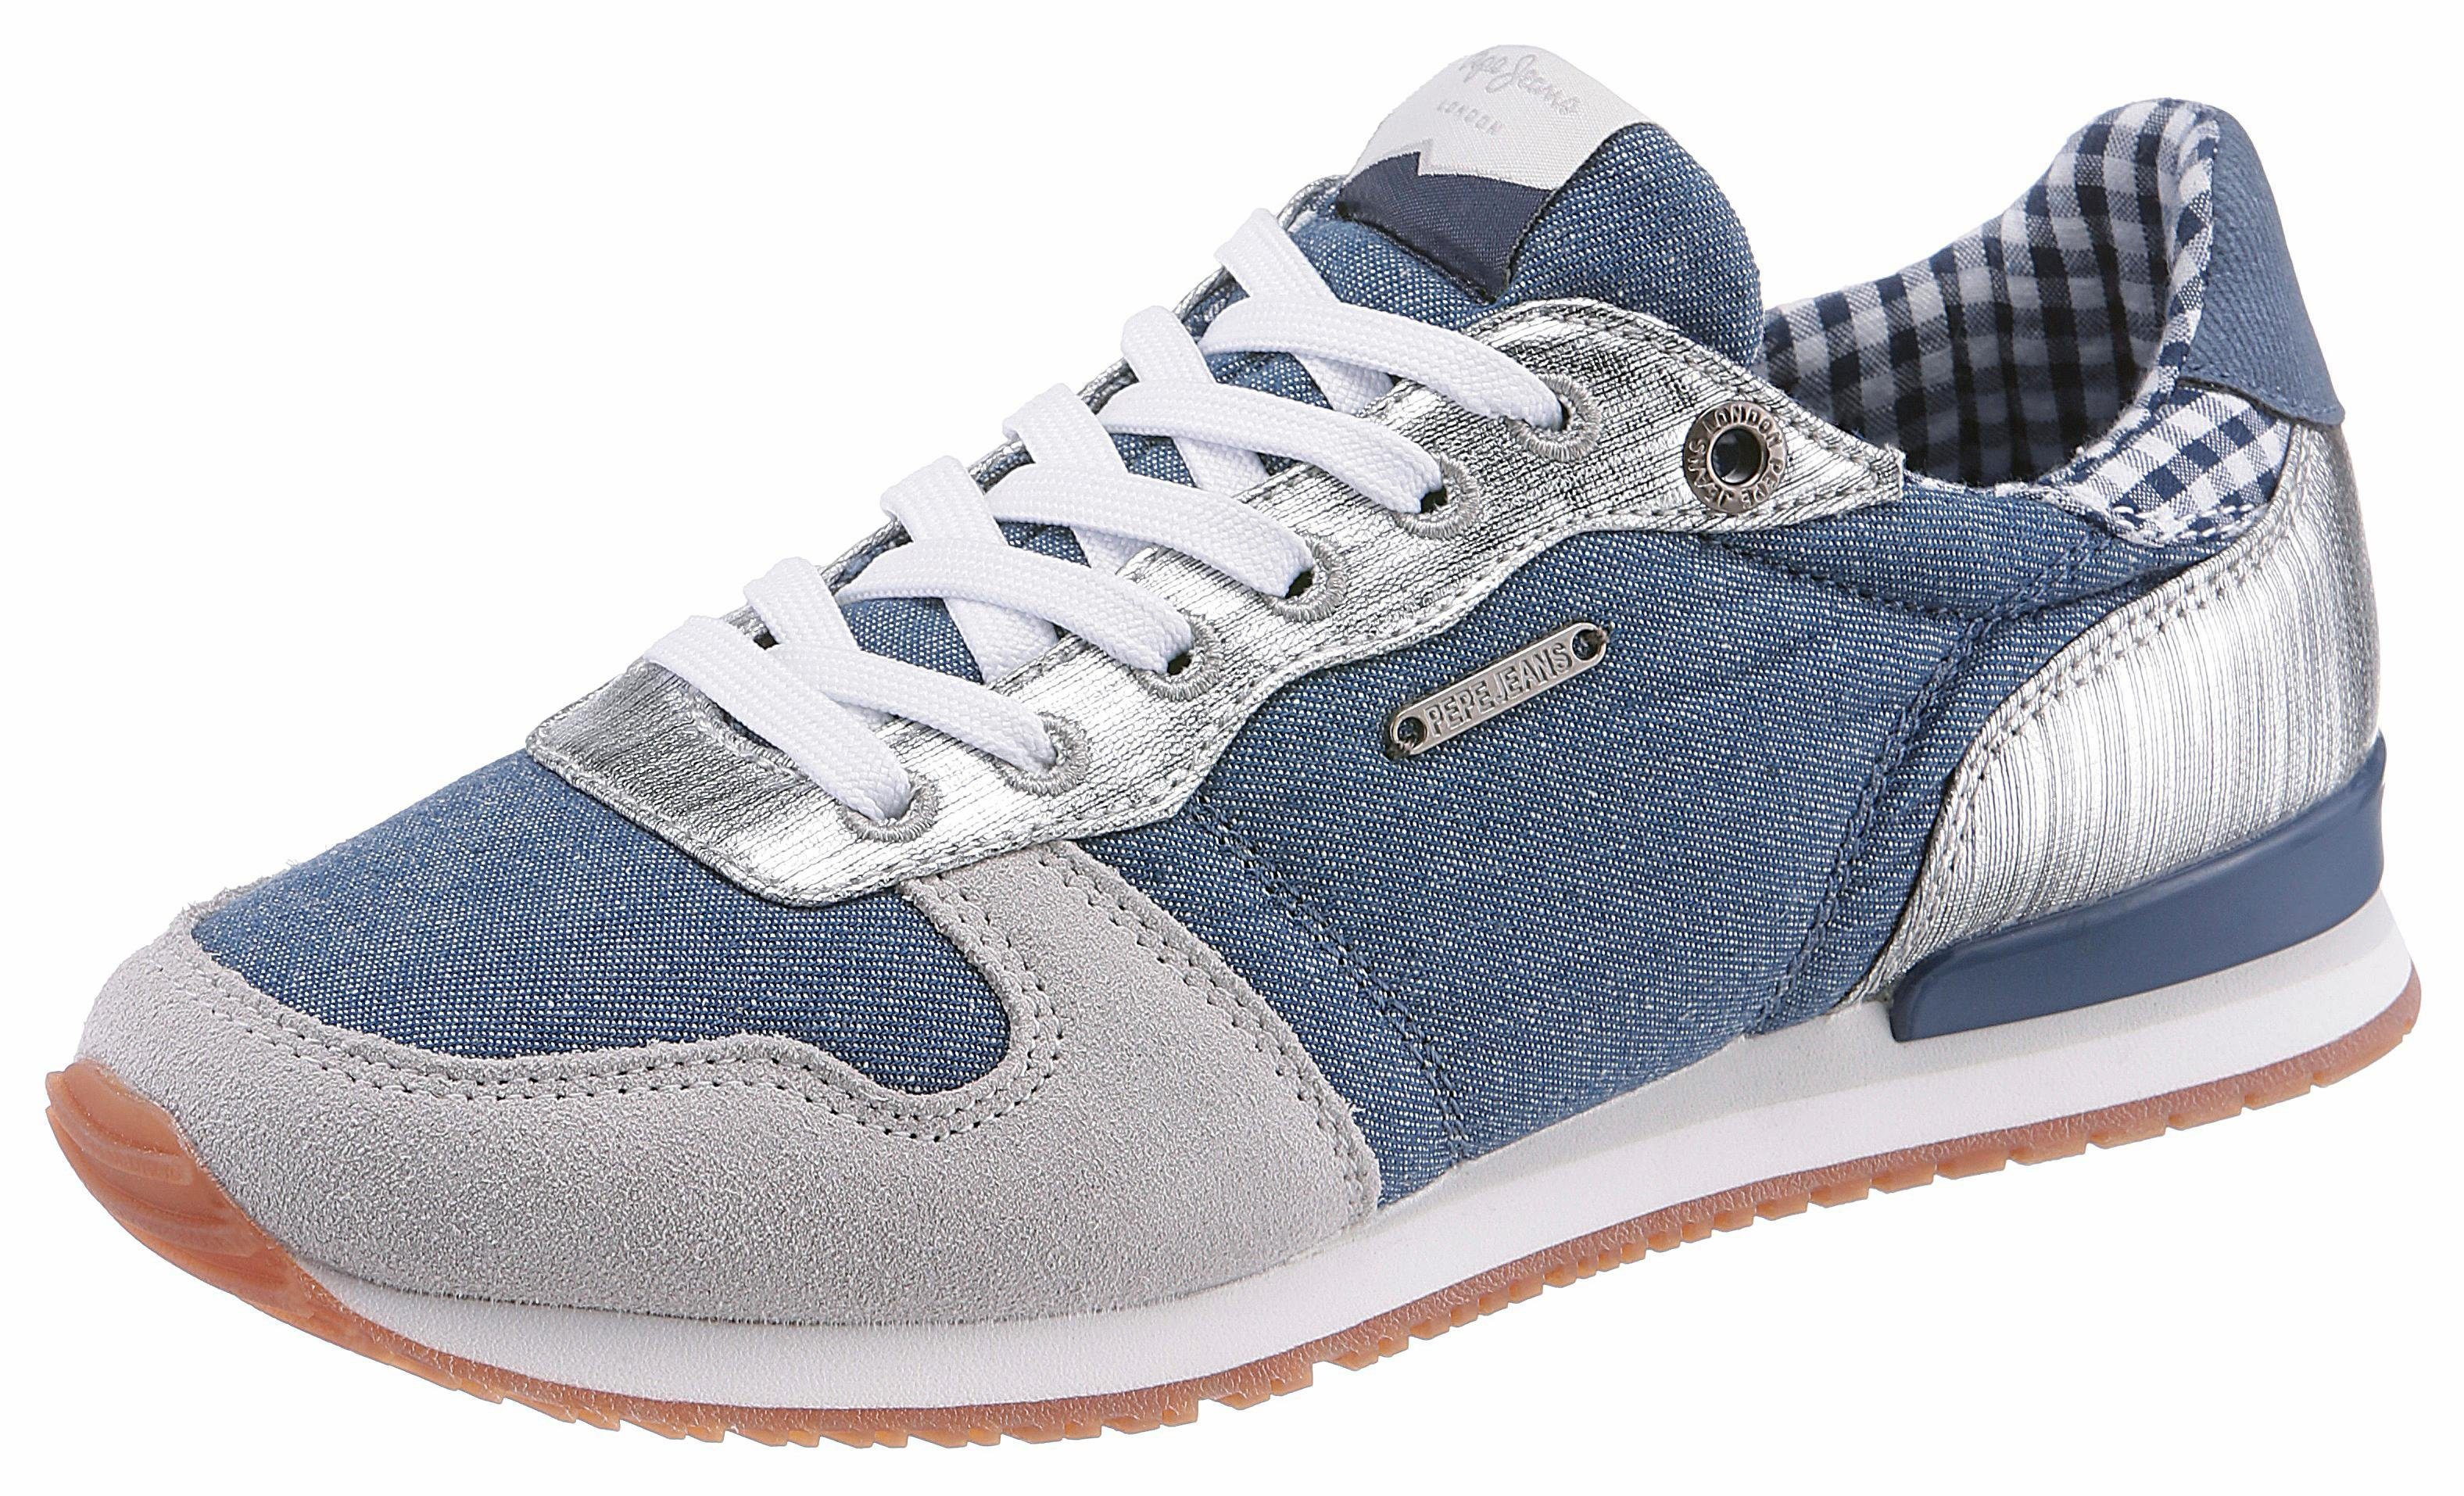 Pepe Jeans »Verona Flash« Sneaker, mit modischen Nieten, blau, 37 37